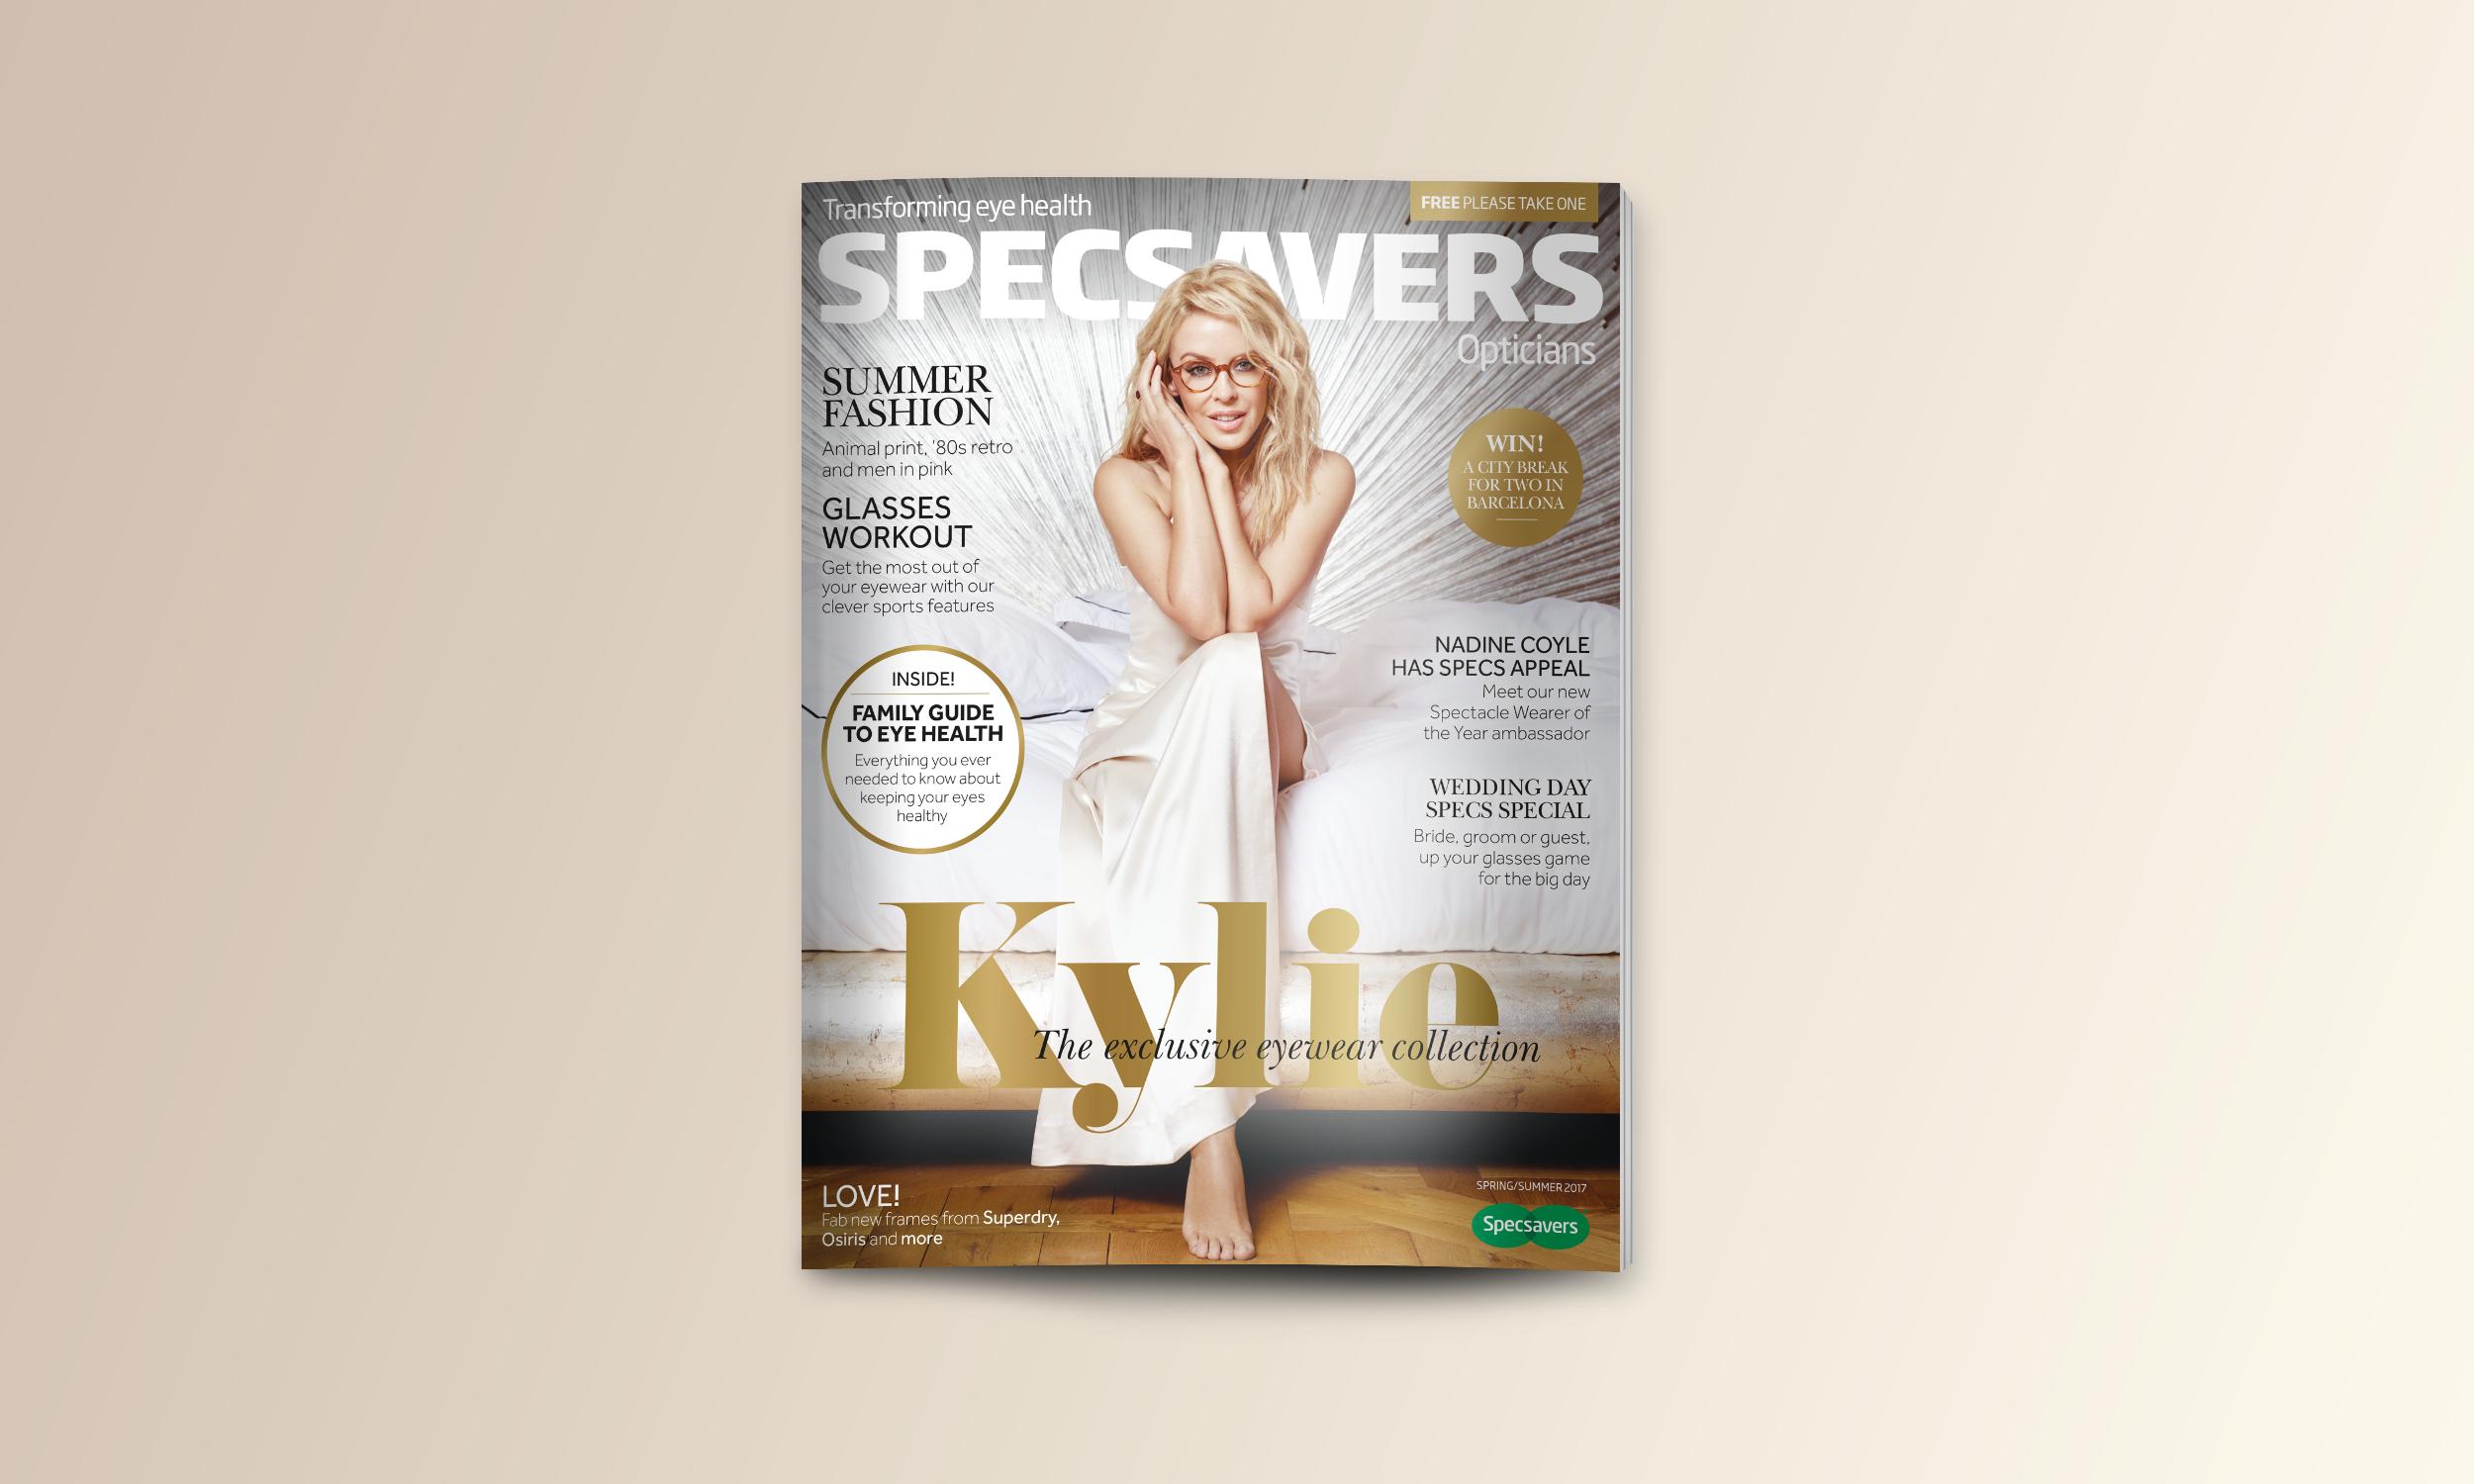 Specsavers Magazine - Kylie minogue Cover